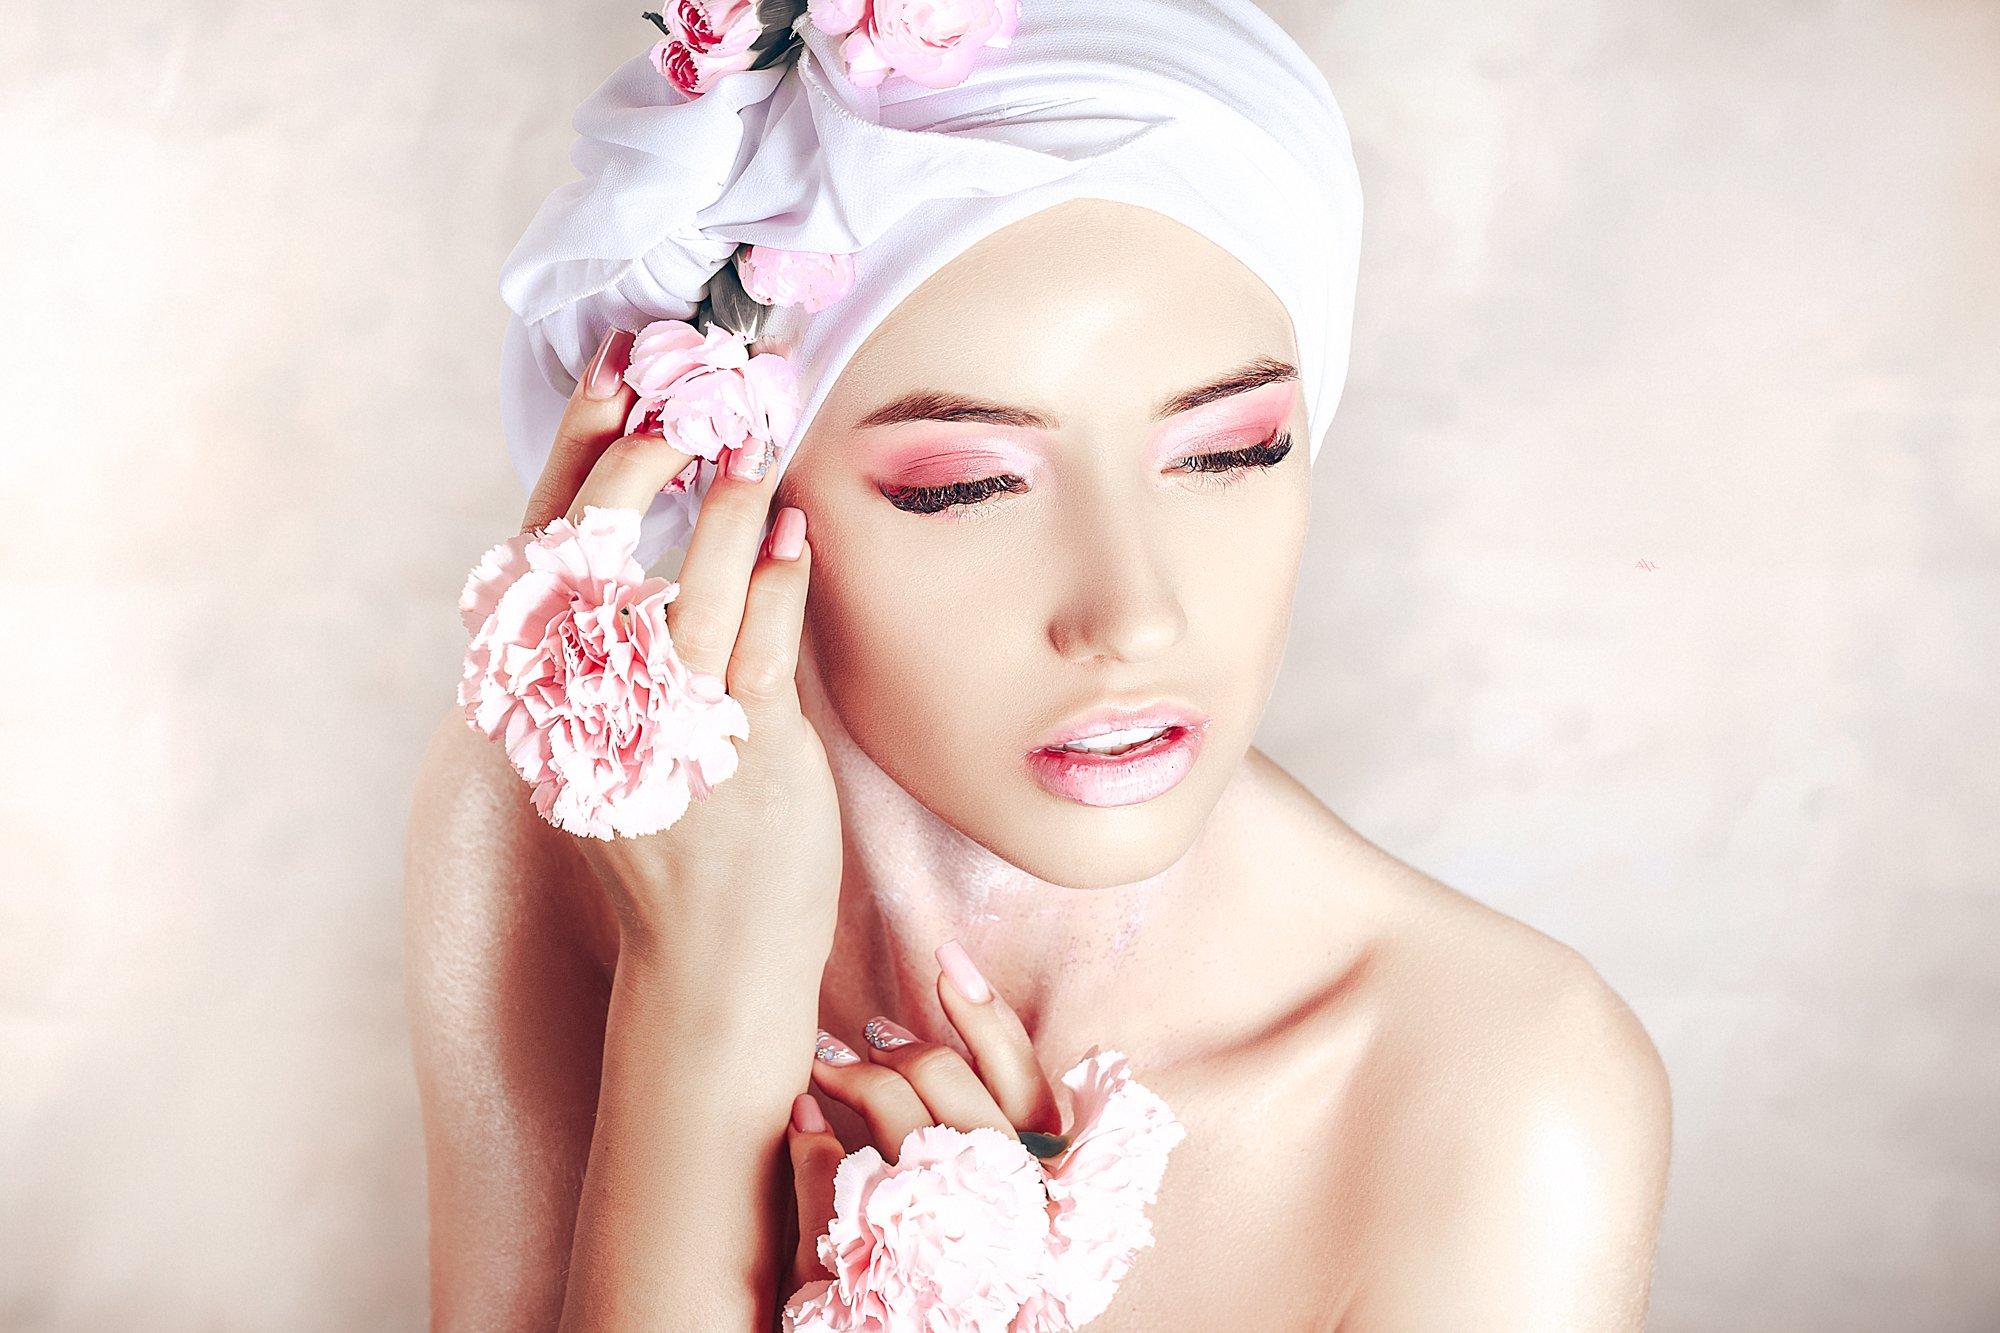 woman, beauty, fashion, art, studio, light, portrait, Руслан Болгов (Axe)